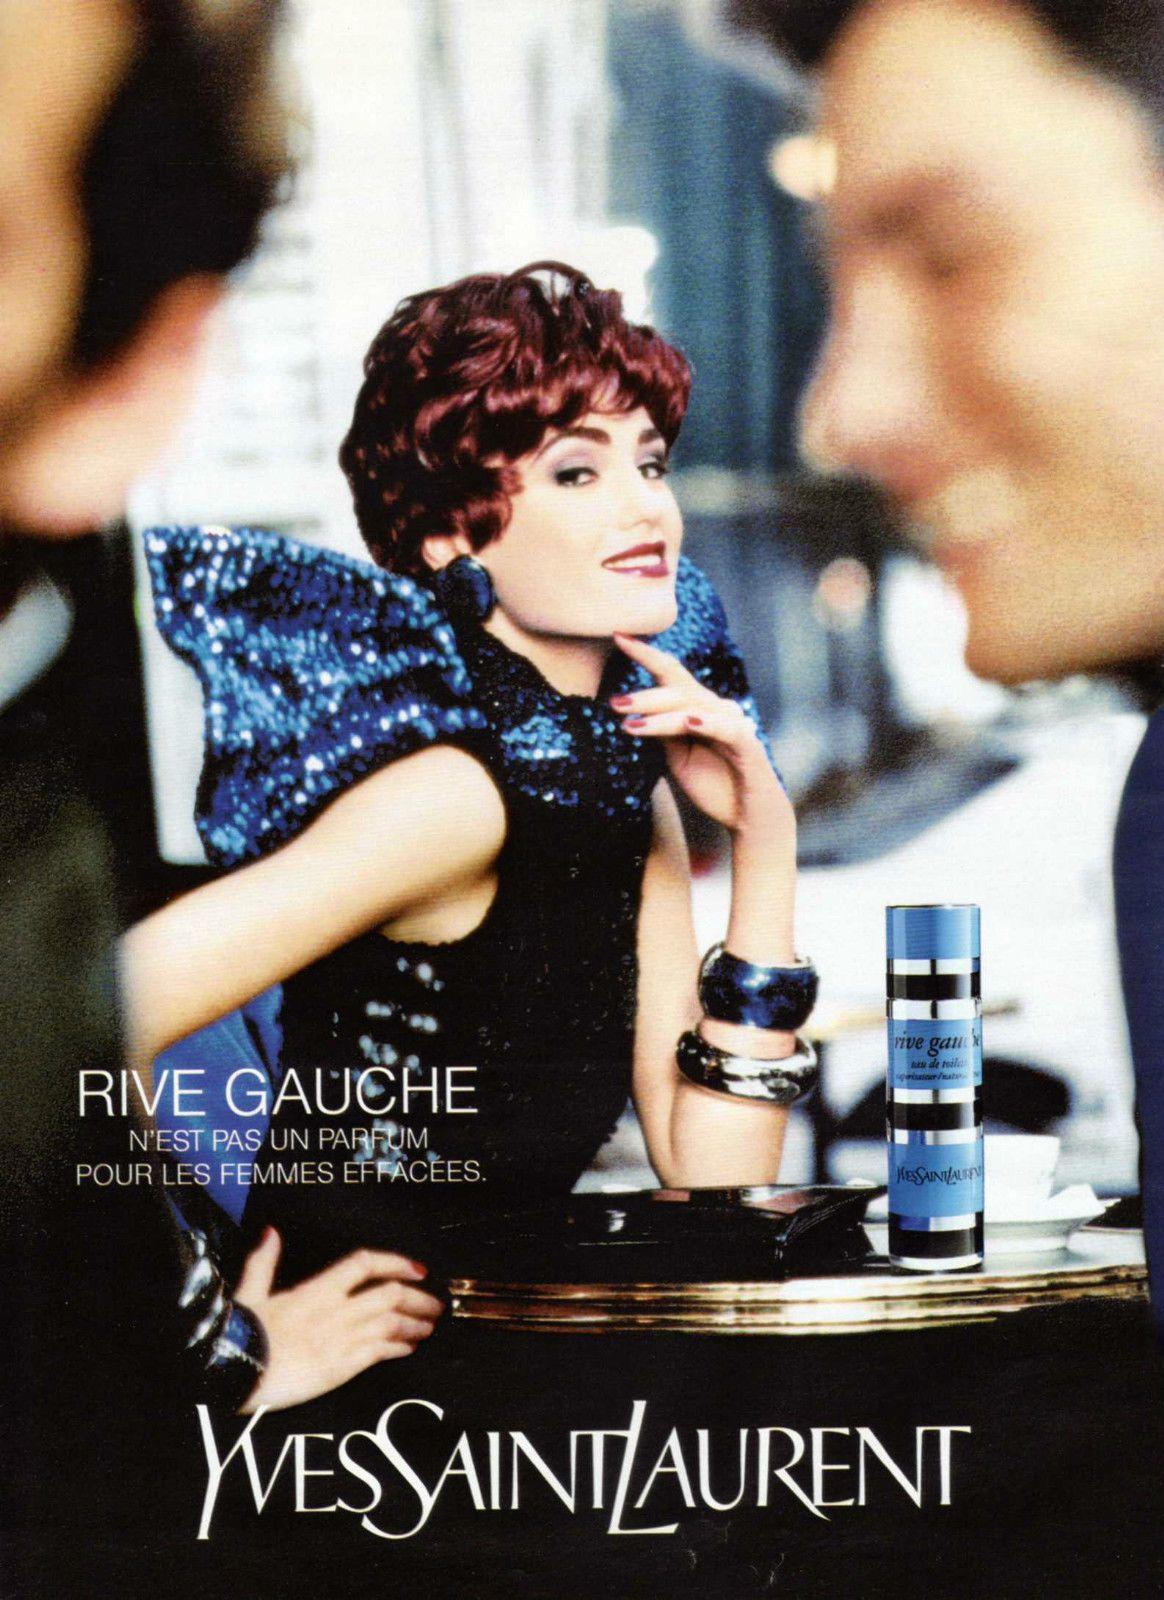 Yves Saint 1992 Publicite Parfum Laurent Gauche Clipping Rive N0ymwO8vn